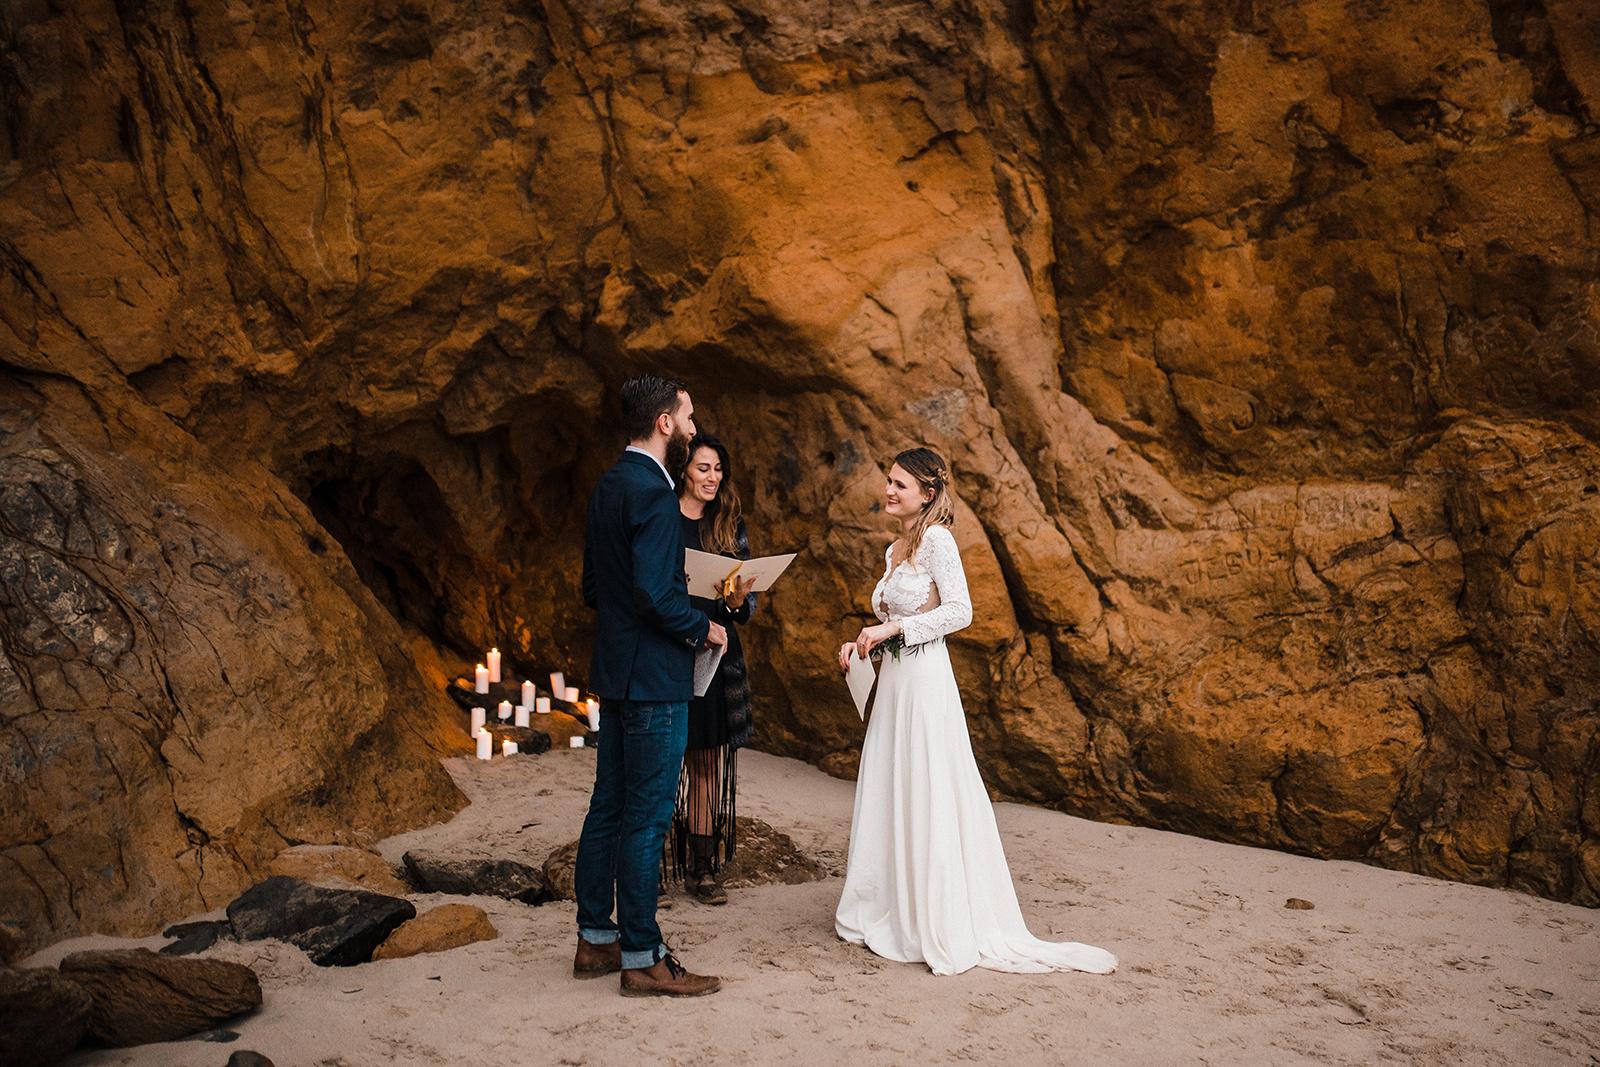 Oregon_Coast_Elopement_Wedding_The_Foxes_Photography_138.jpg